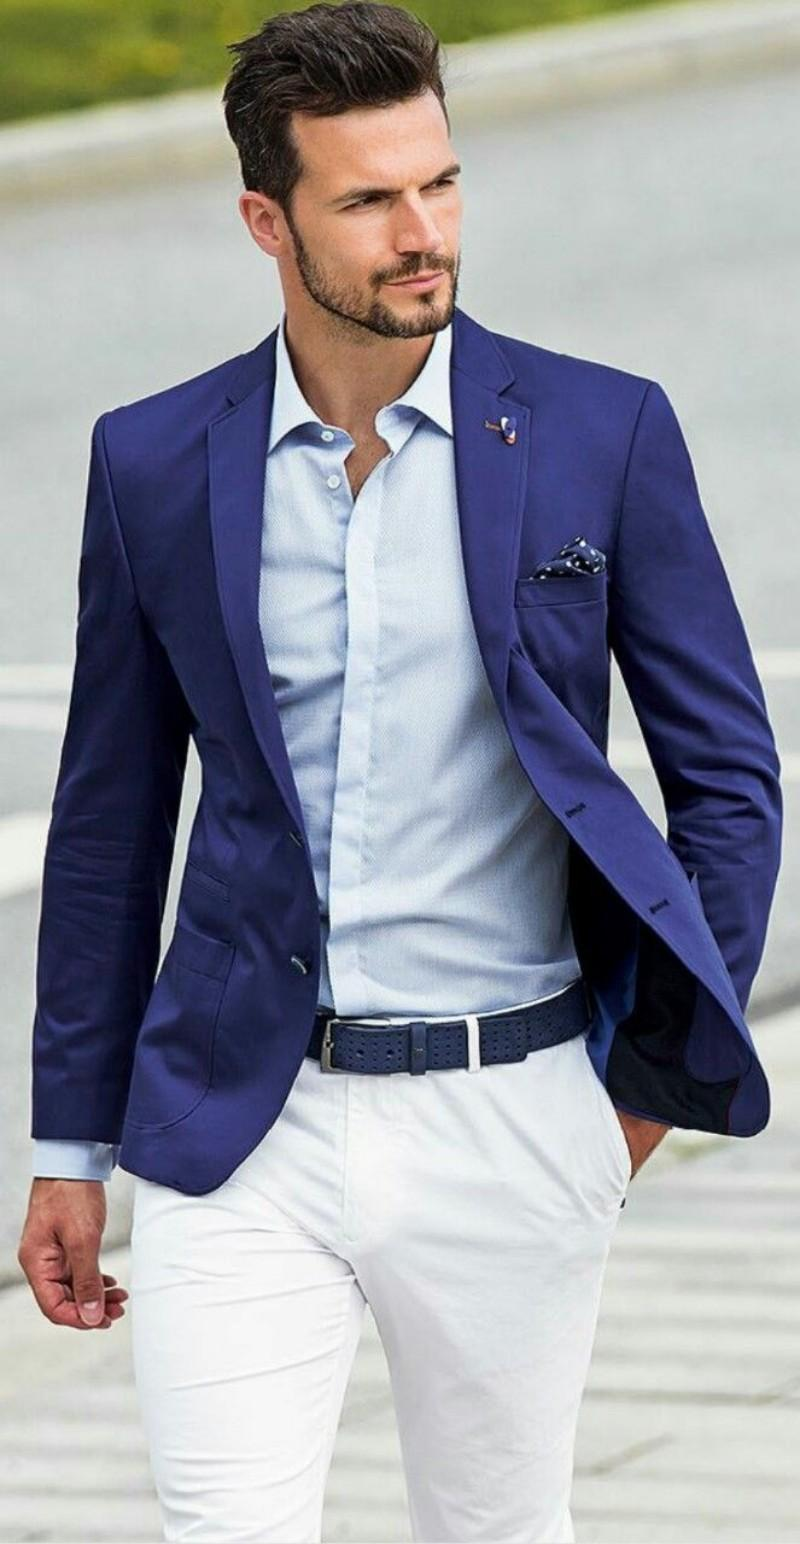 Beach Groom Tuxedos Suit Fit Two Button Slim Spring Party Best Man Evening Casual Men Suits Groomsman/Men Suits (Jacket+Pants+Tie) C1657